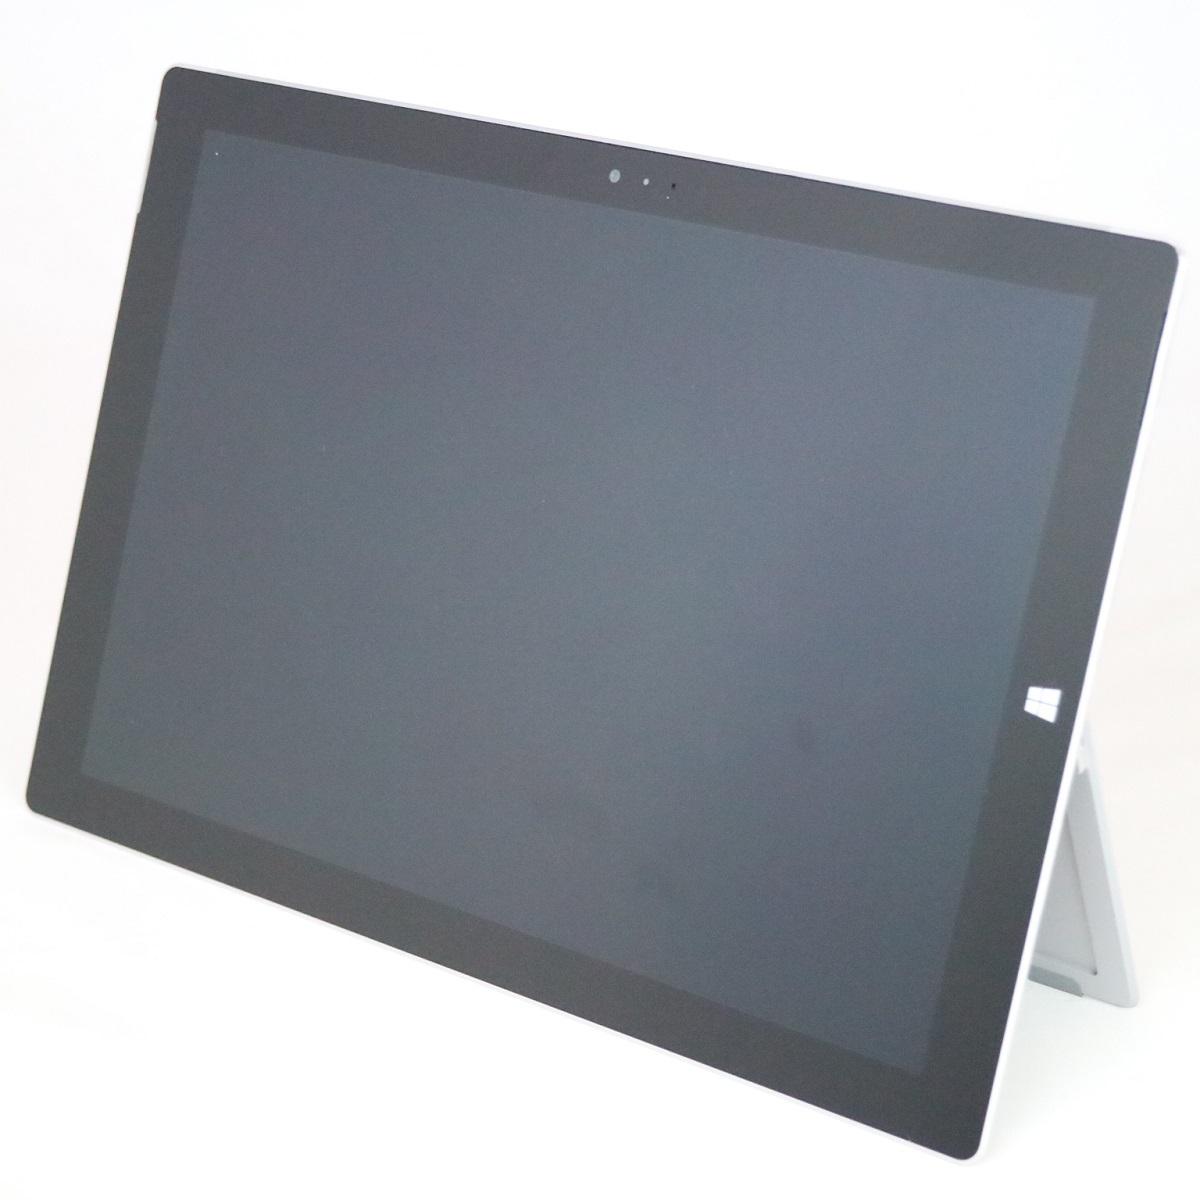 【SALE】Surface Pro 3 (QG2-00014)/ Wi-Fi/ 256GB/ 12inch